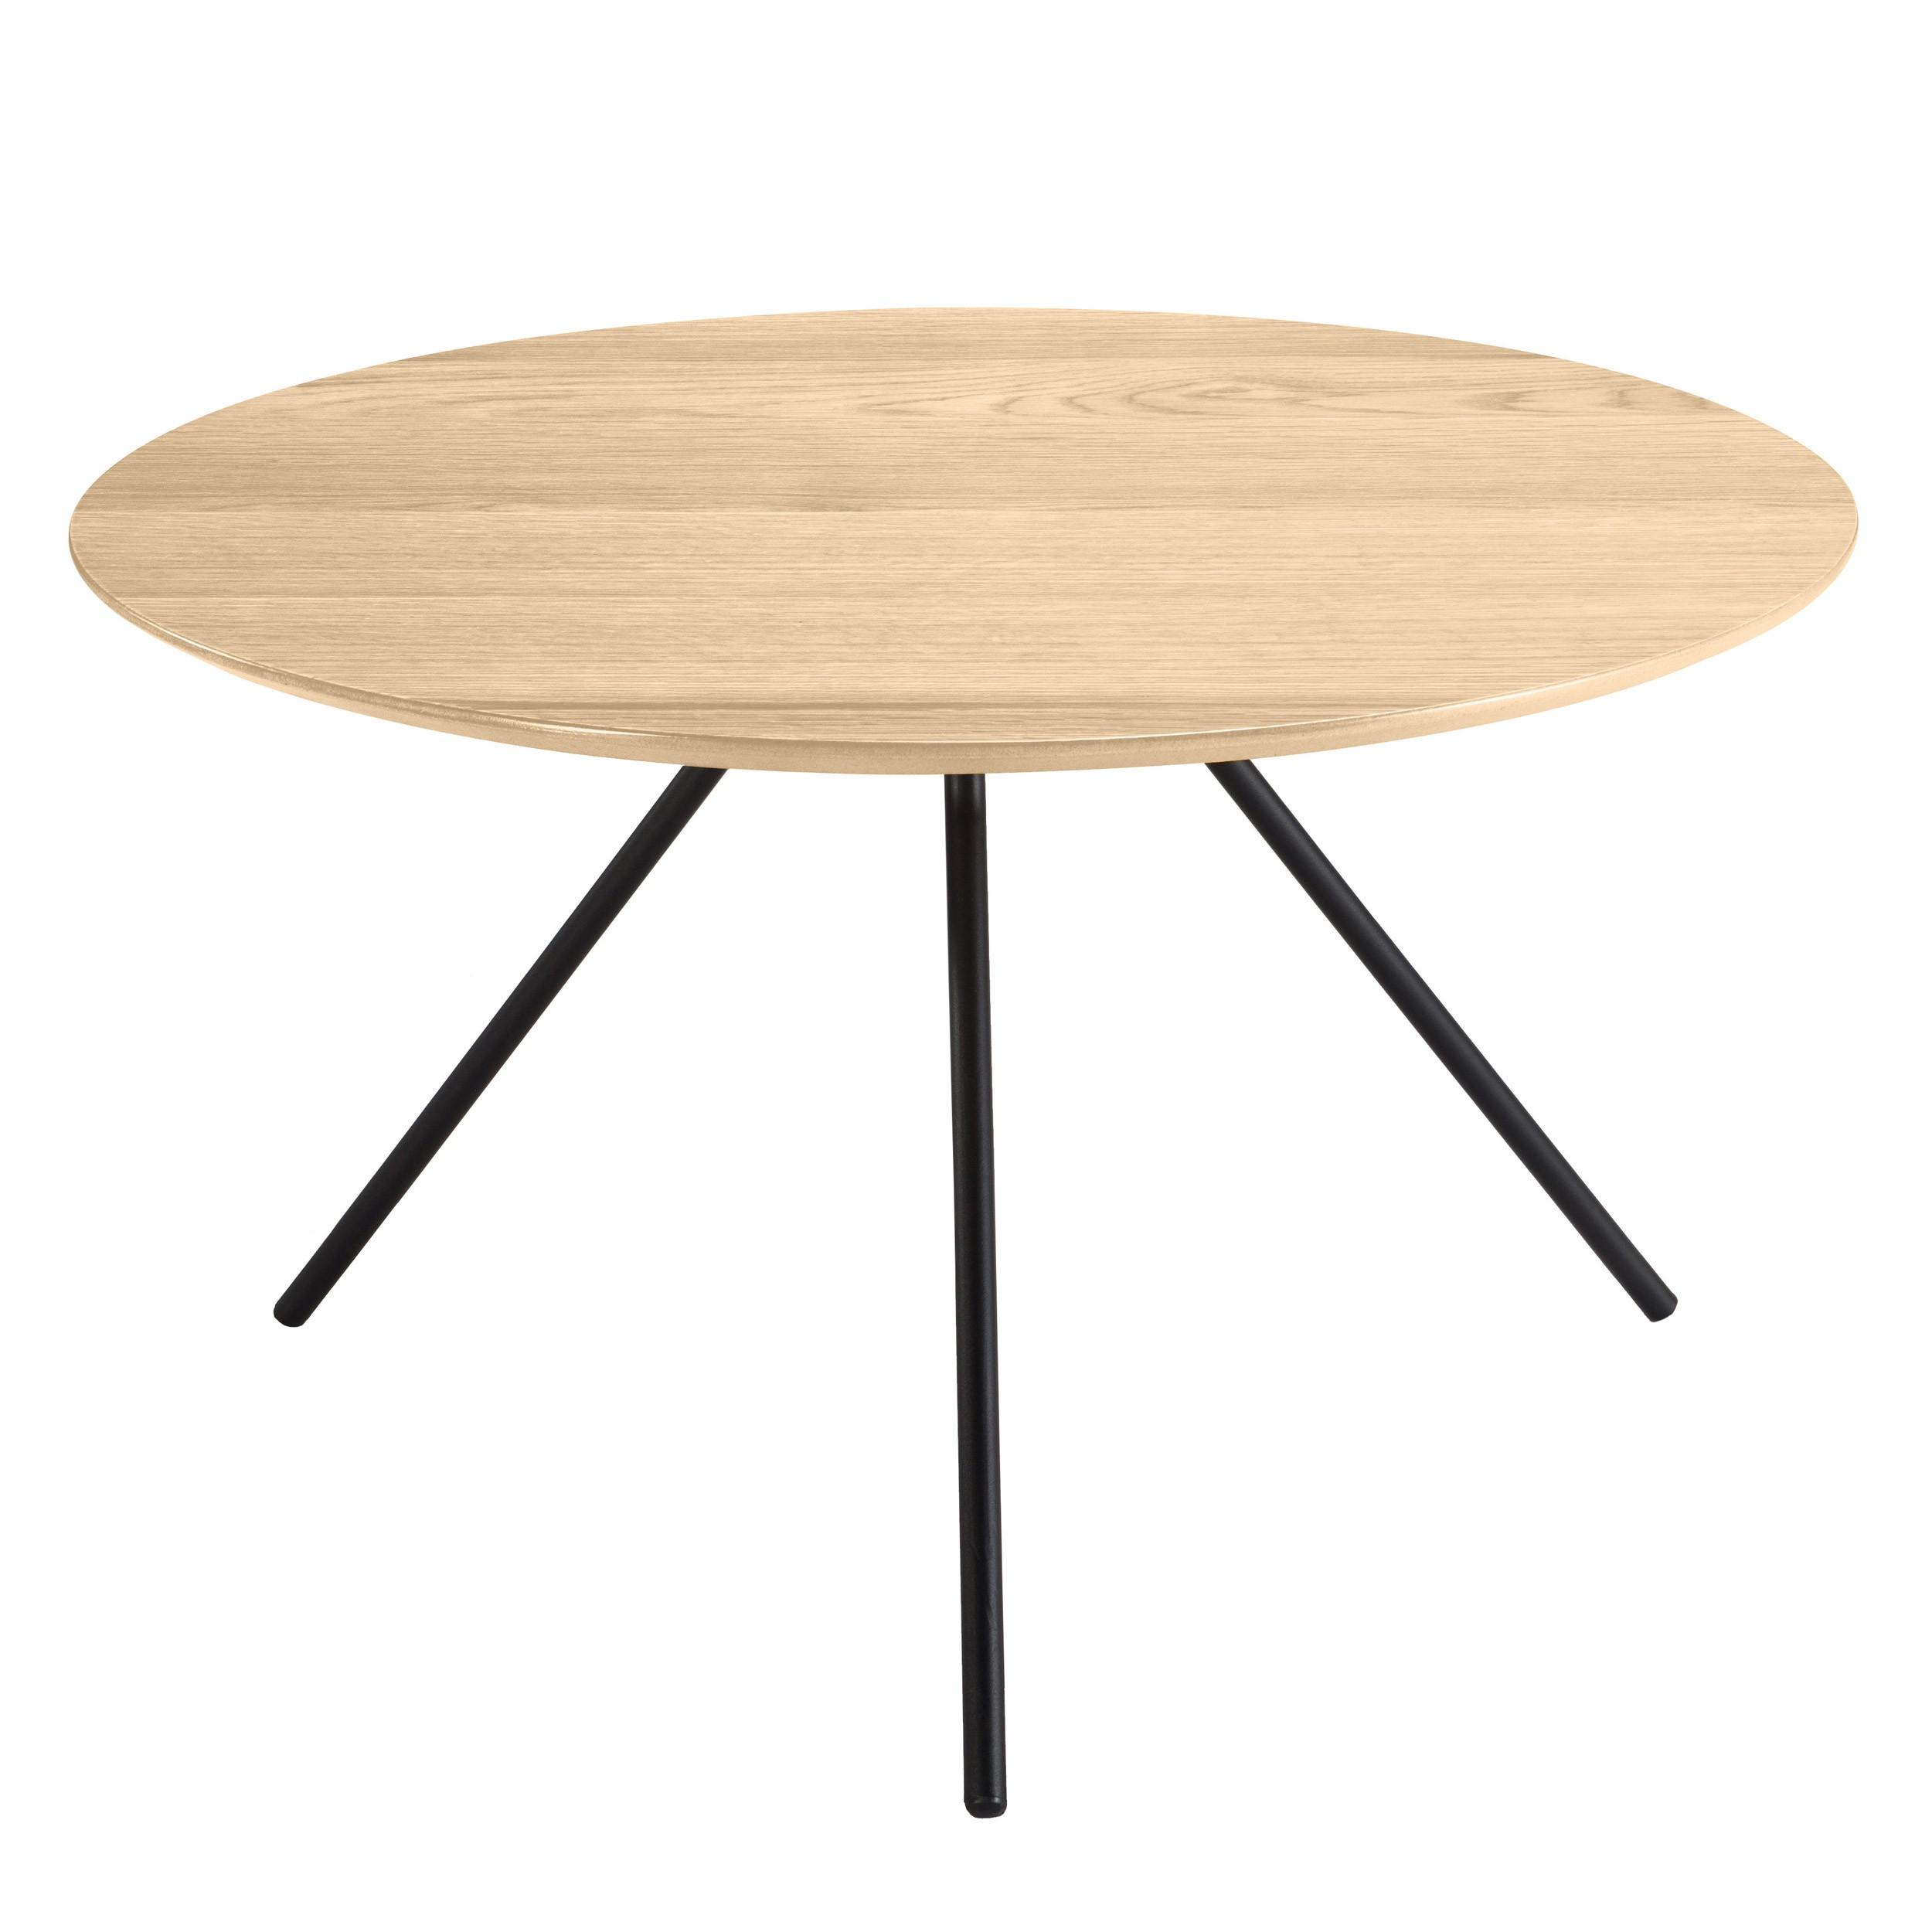 Acheter Table Ronde Bois Pieds Metal